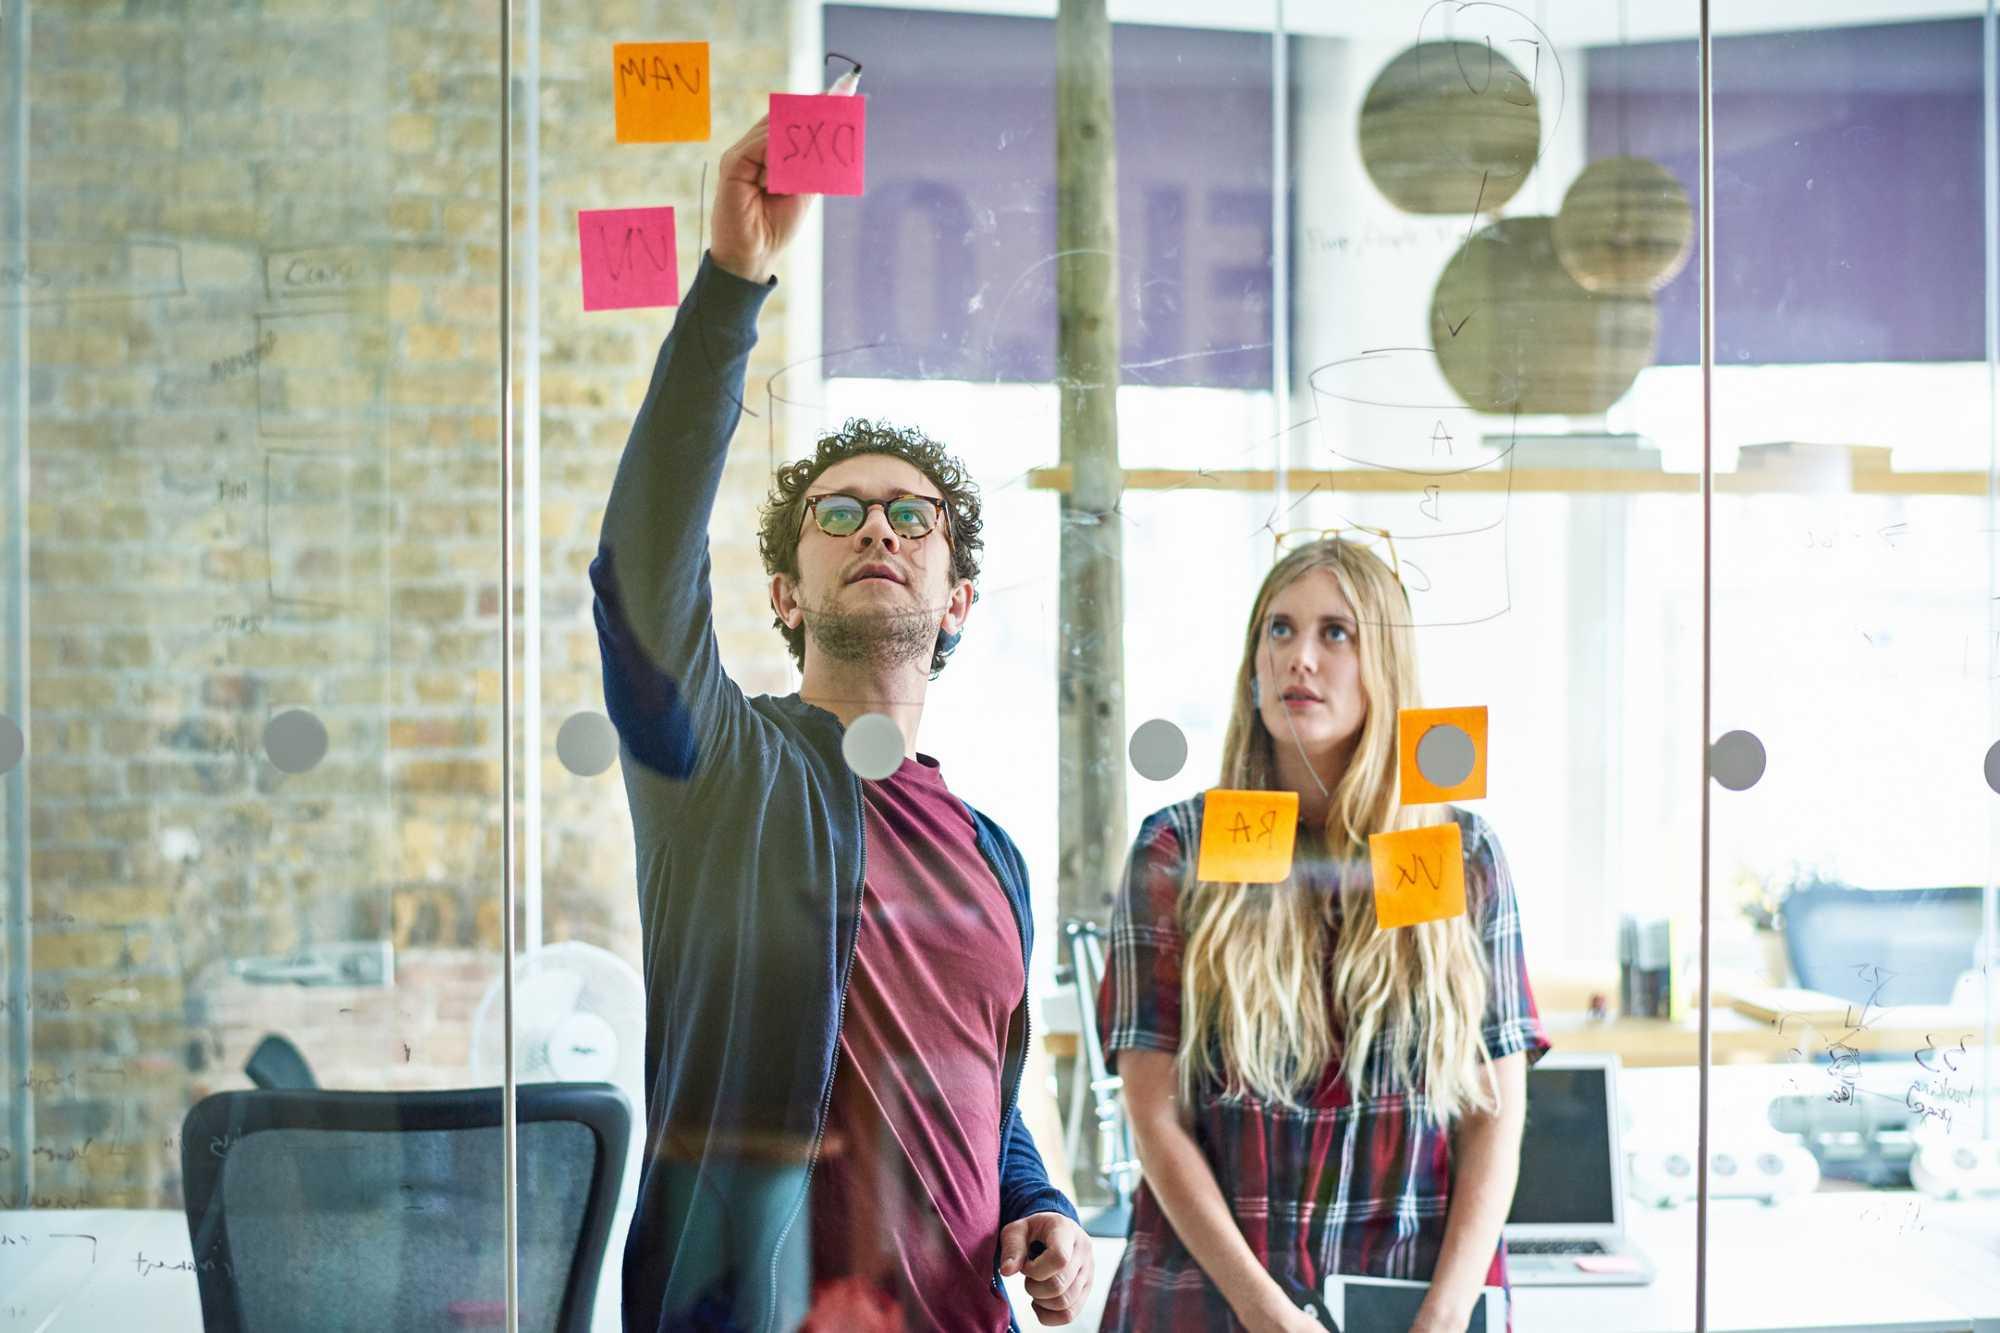 4 desafios da equipe multidisciplinar de TI e como superá-los